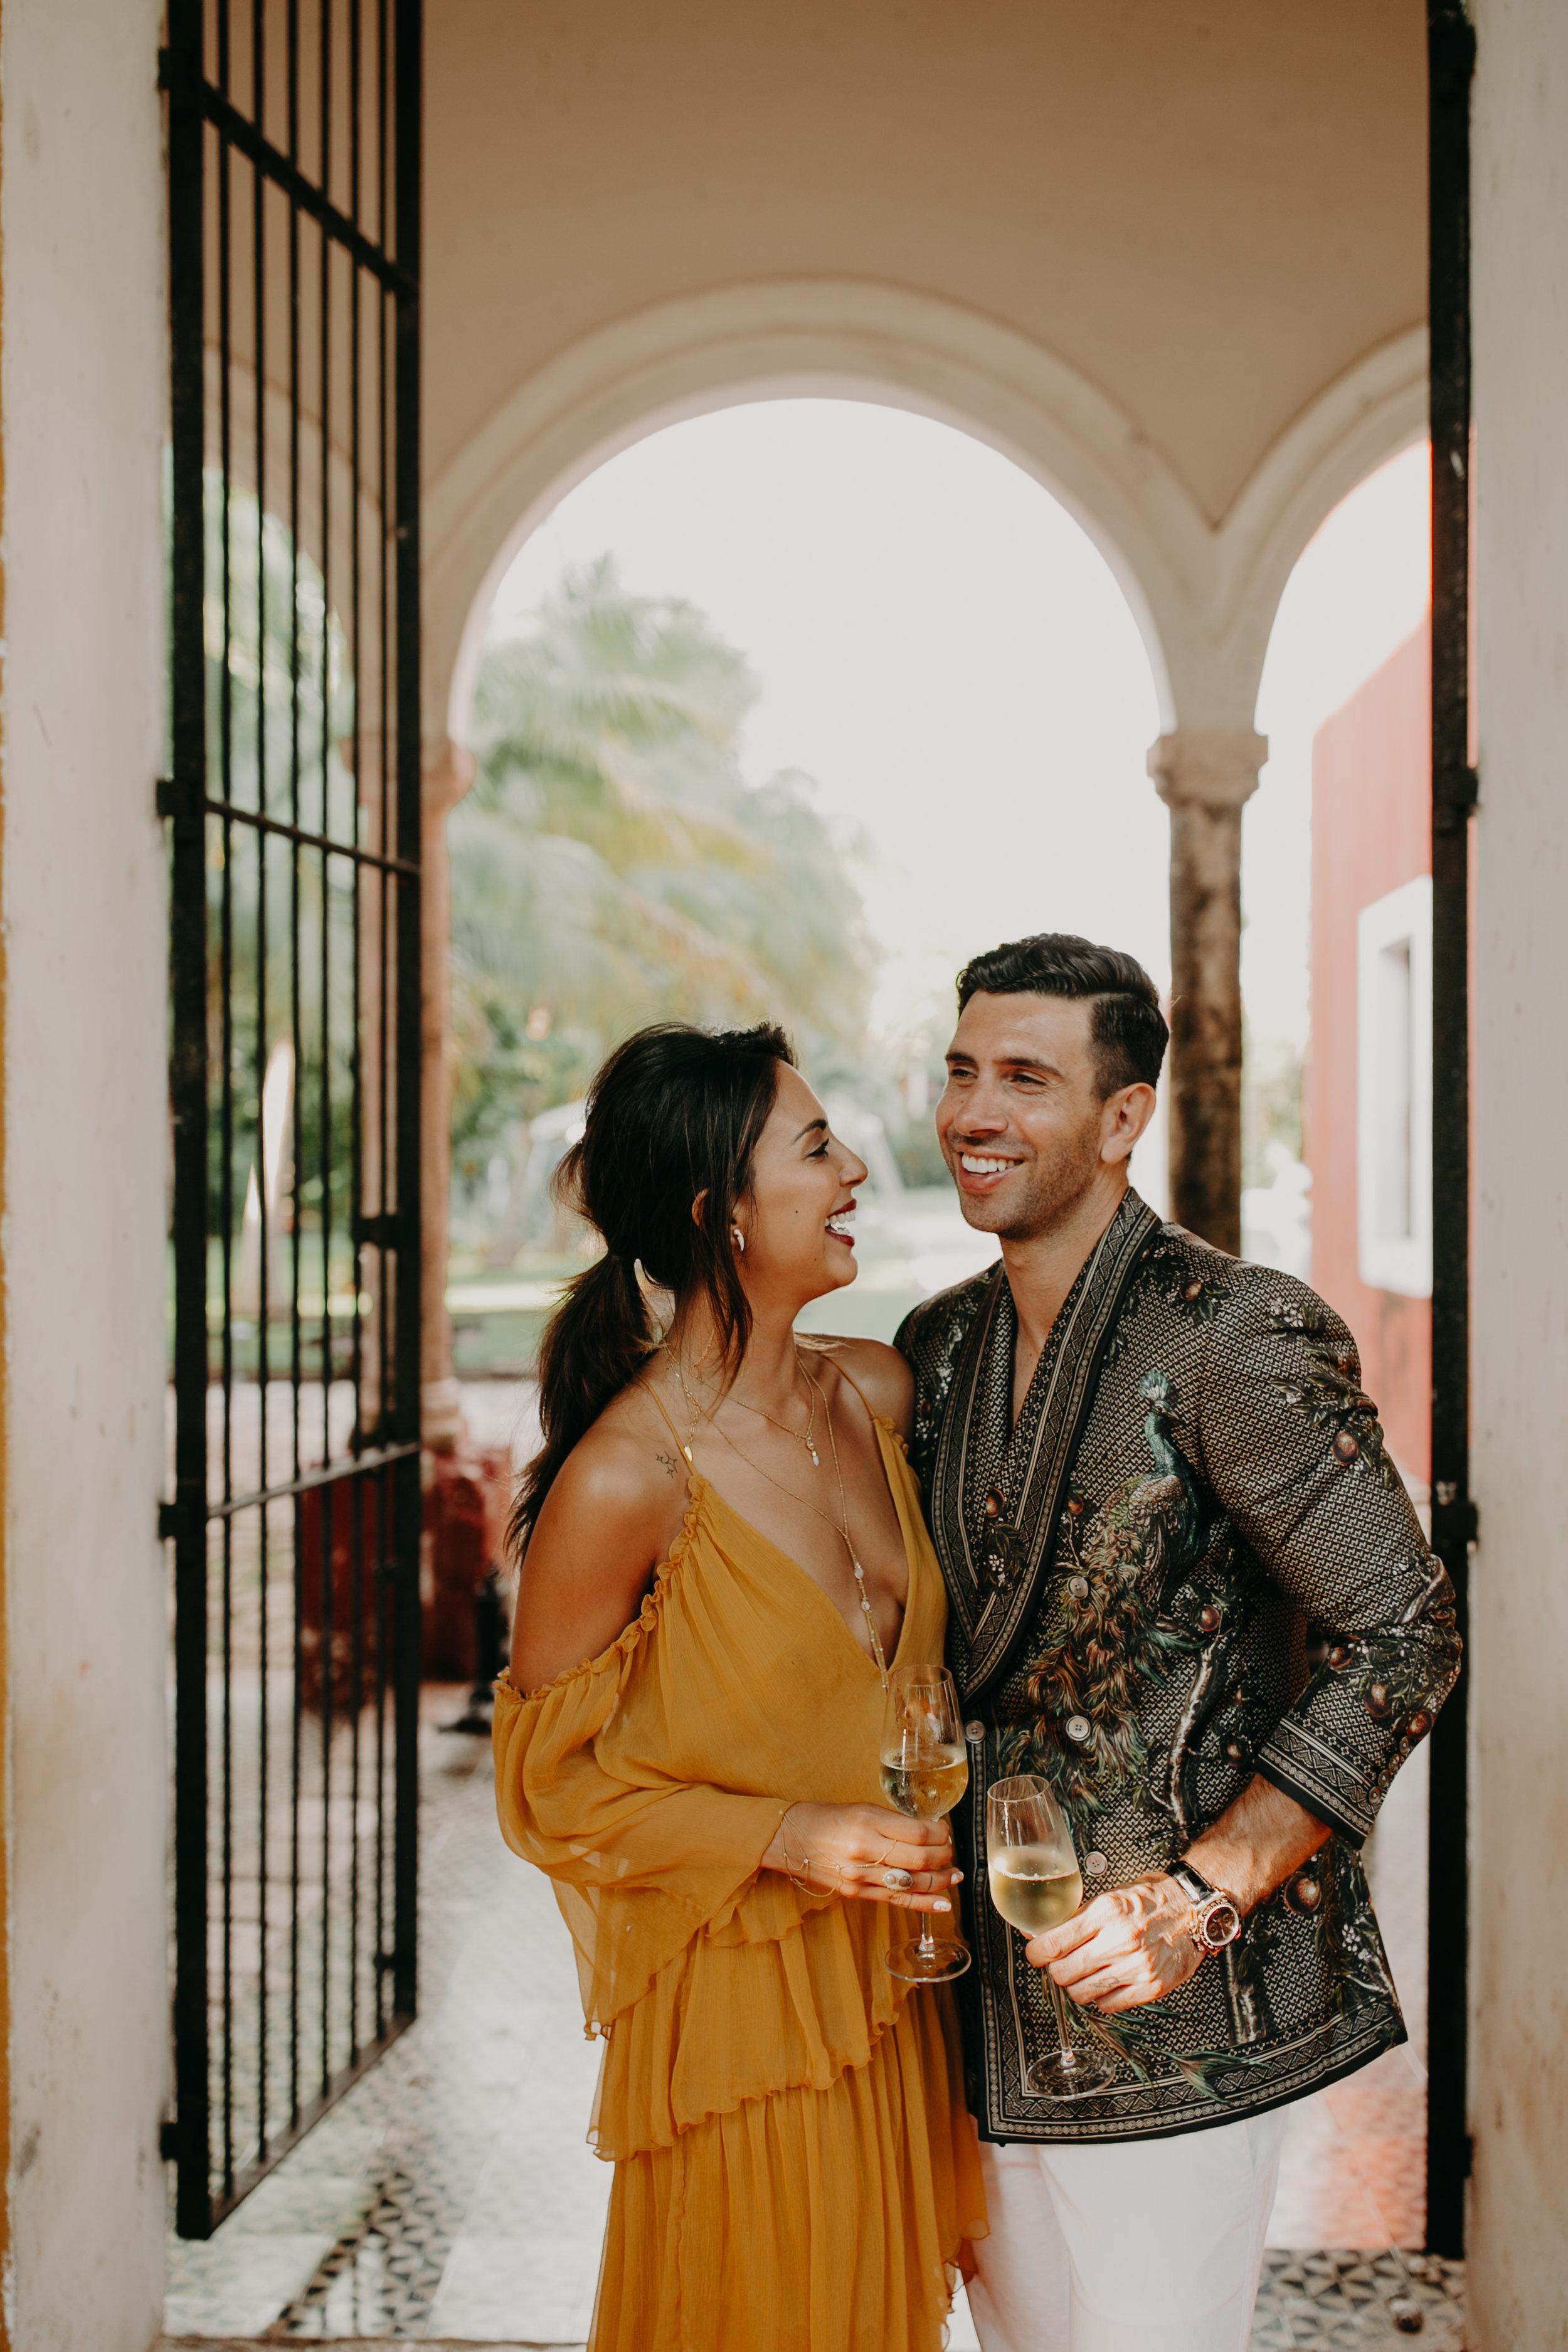 Hacienda Temozon Yucatan Mexico Wedding | Ida & Peter Emily Magers Photography-92.jpg